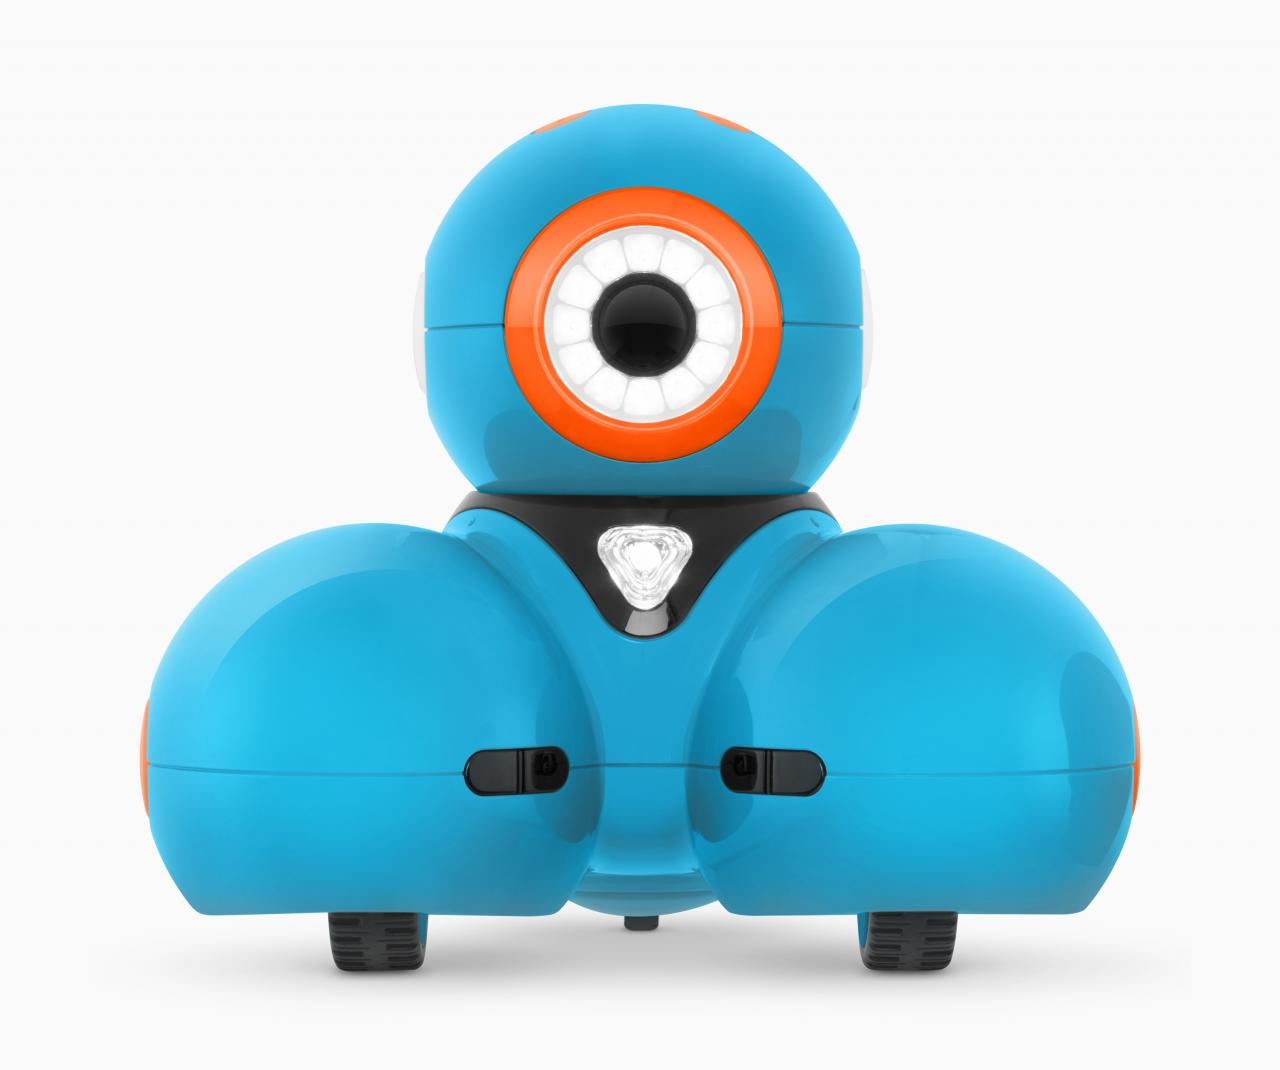 sihirli-elma-swift-playgorunds-1-5-wonder-workshop-dash-robot.jpg